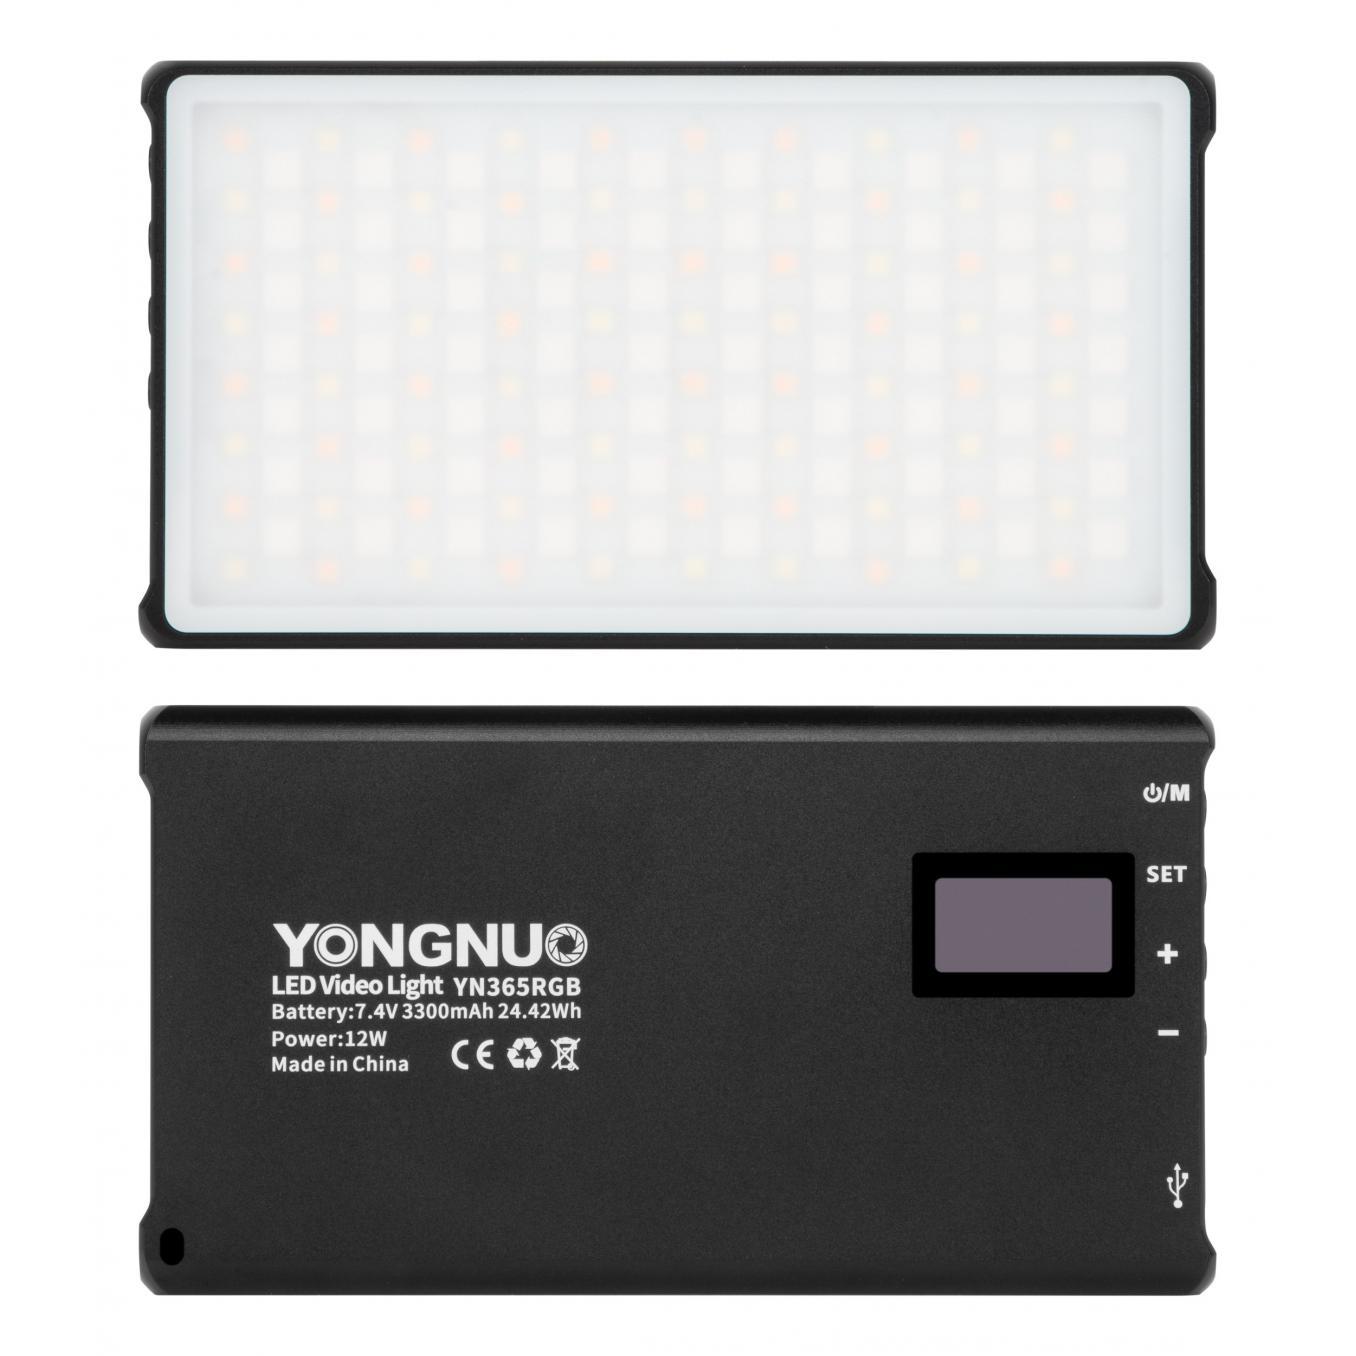 Yongnuo YN365 RGB LED Light - WB (2500 K - 8500 K)